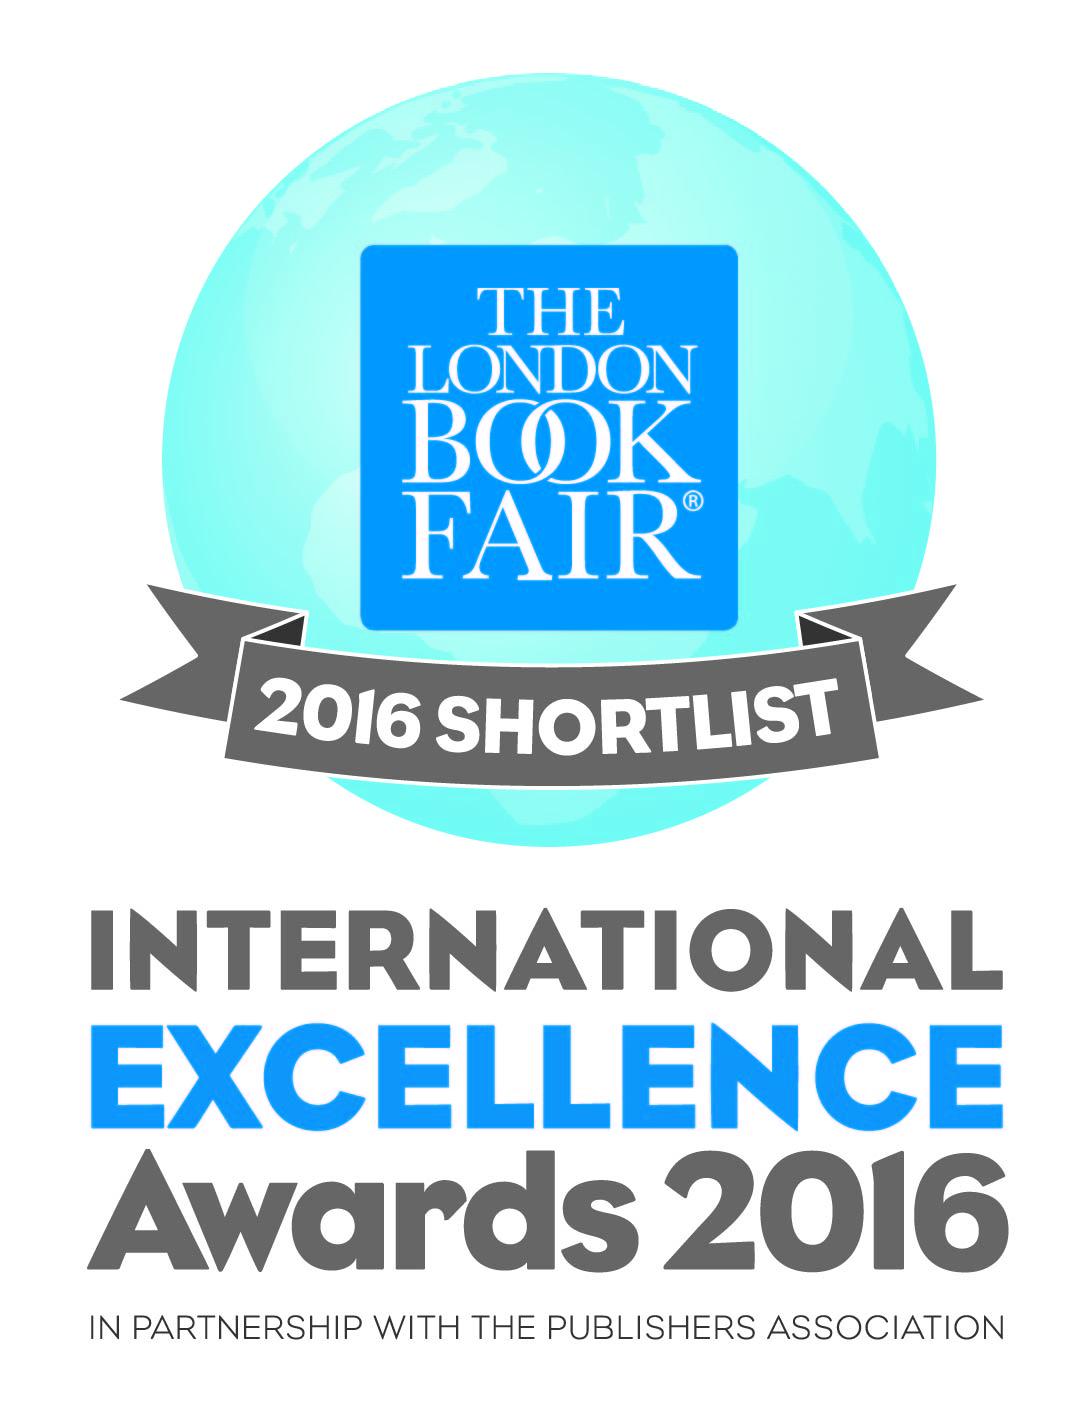 The London Book Fair International Excellence Awards – logotyp (źródło: materiały prasowe)